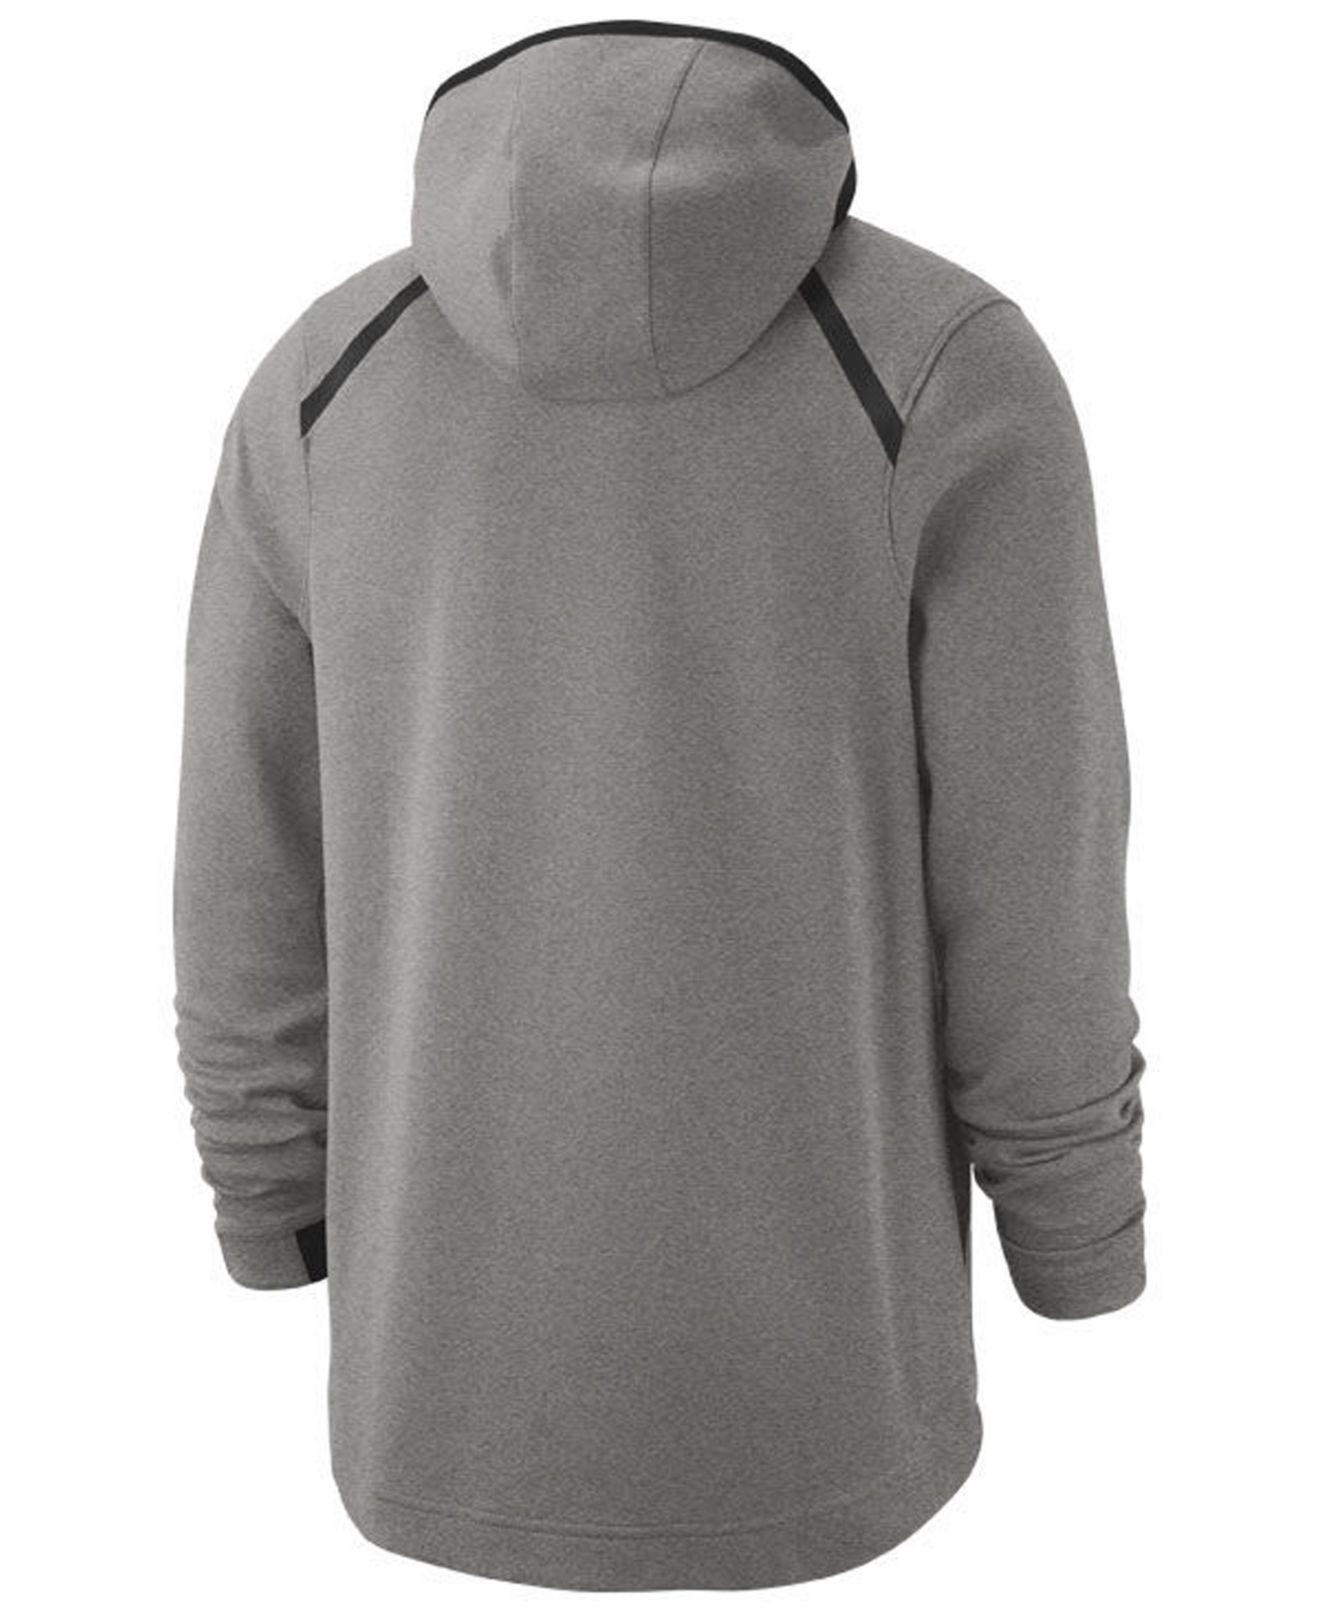 online store f442d f1977 New York Knicks Nba Mens 1 4 Zip Pullover Sweatshirt